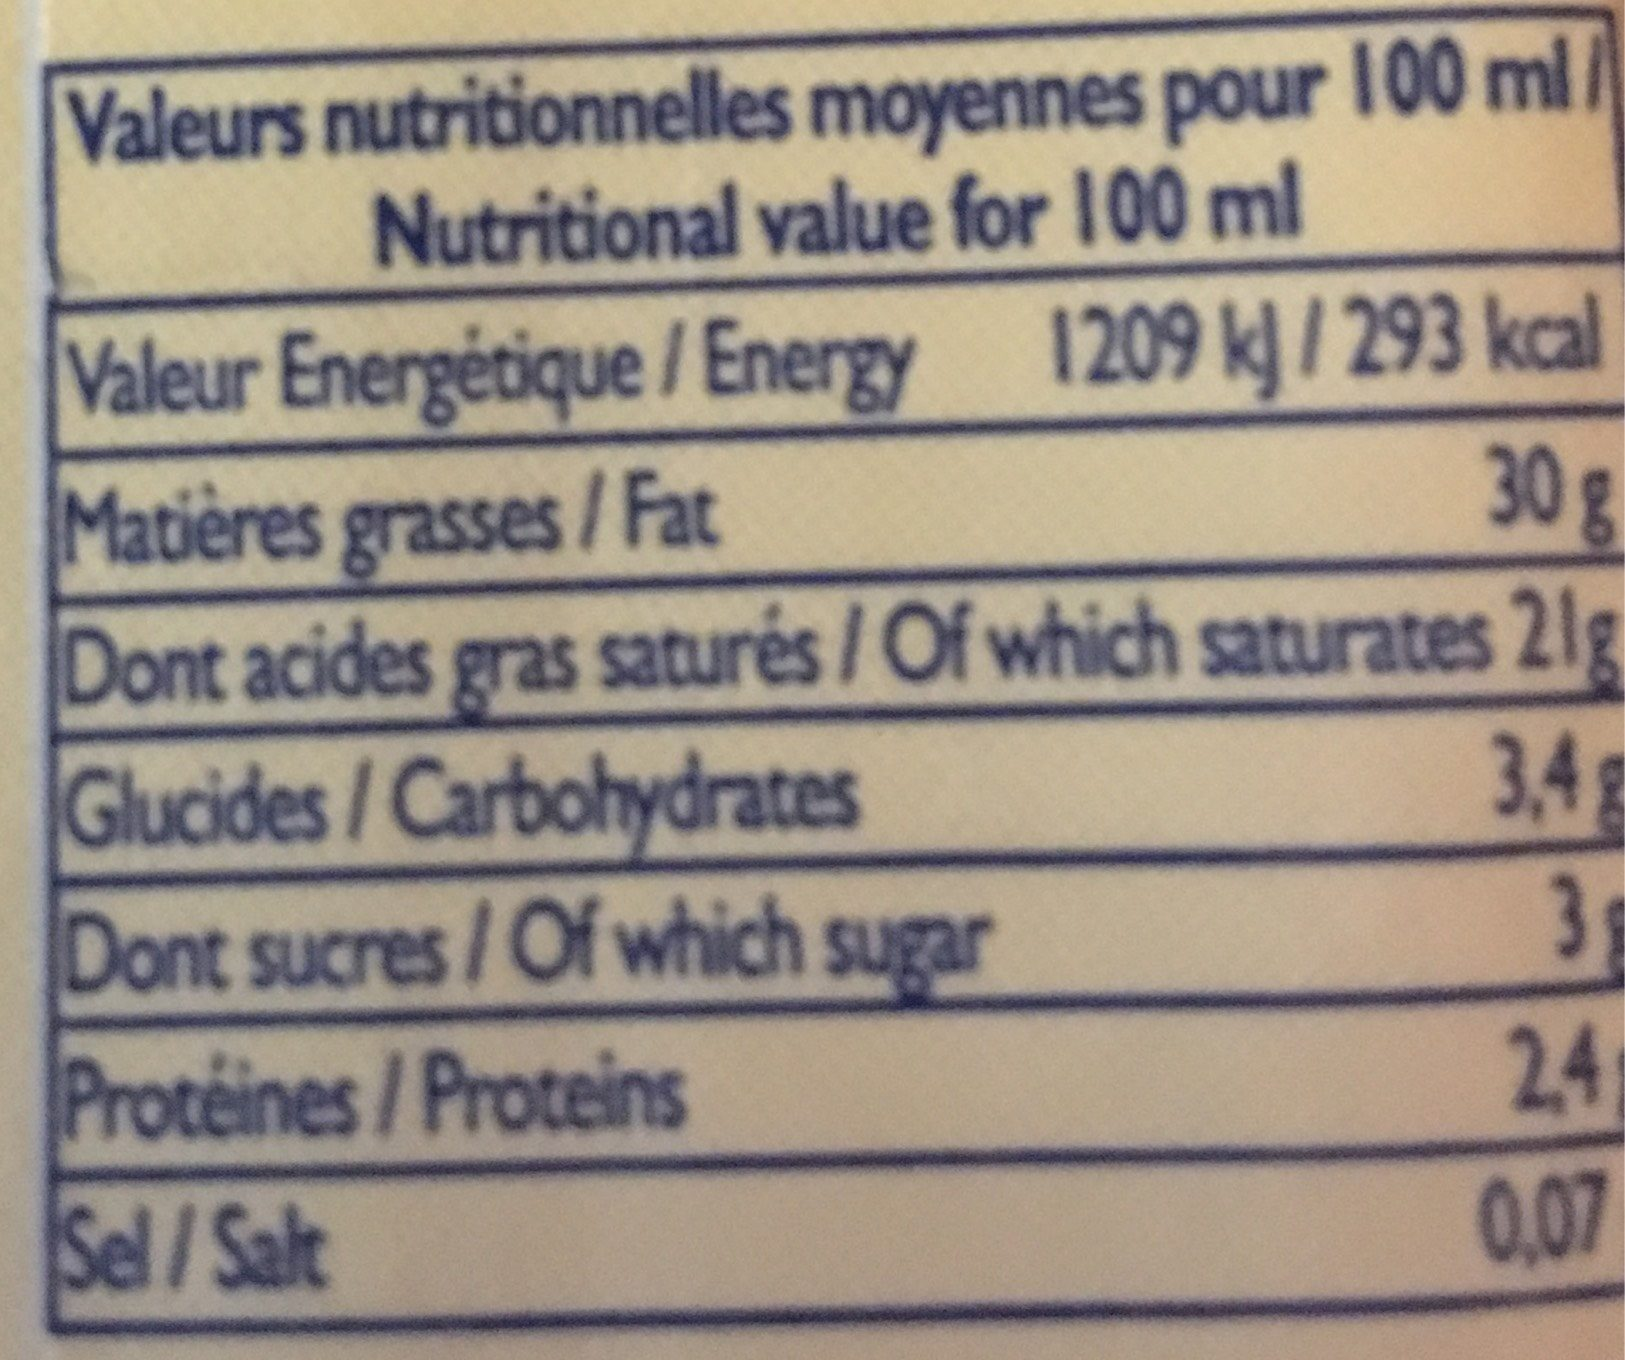 CREME UHT 30% - Informazioni nutrizionali - fr